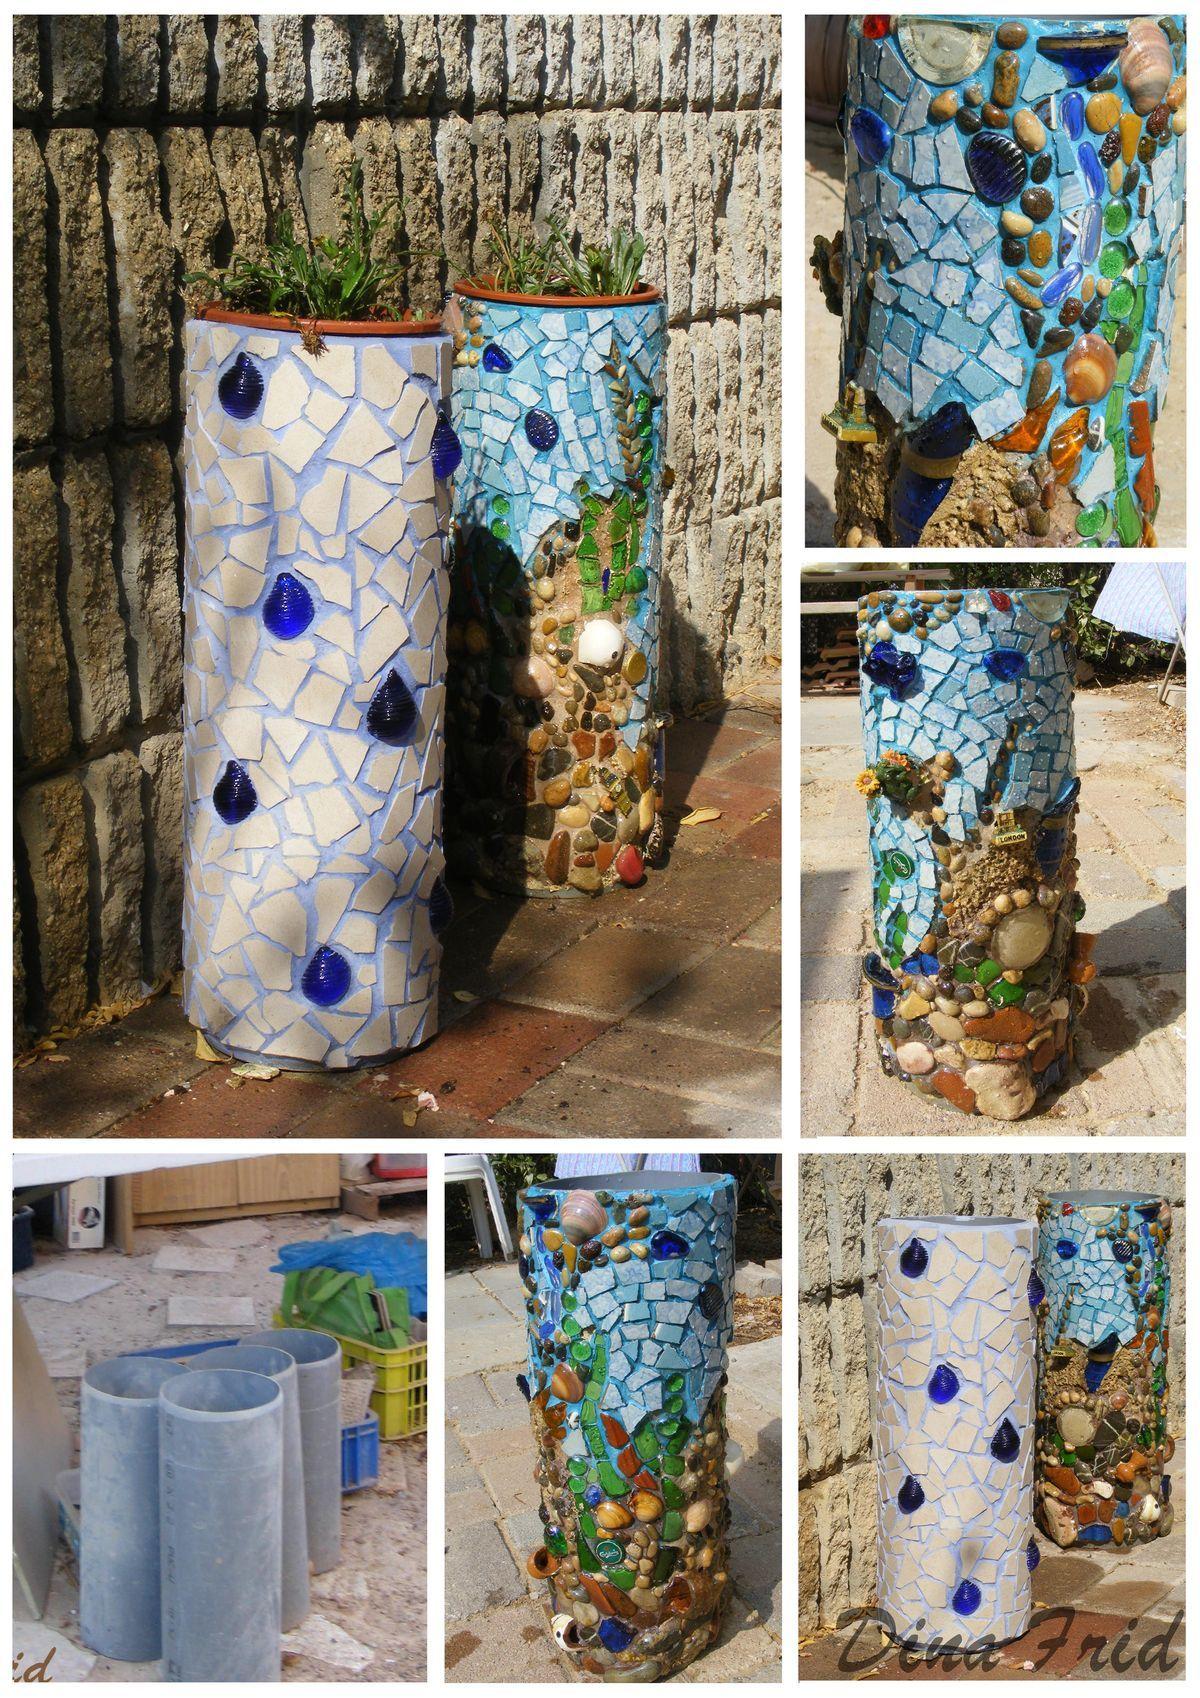 Diy mosaic planter diy pinterest mosaic planters for Pvc crafts